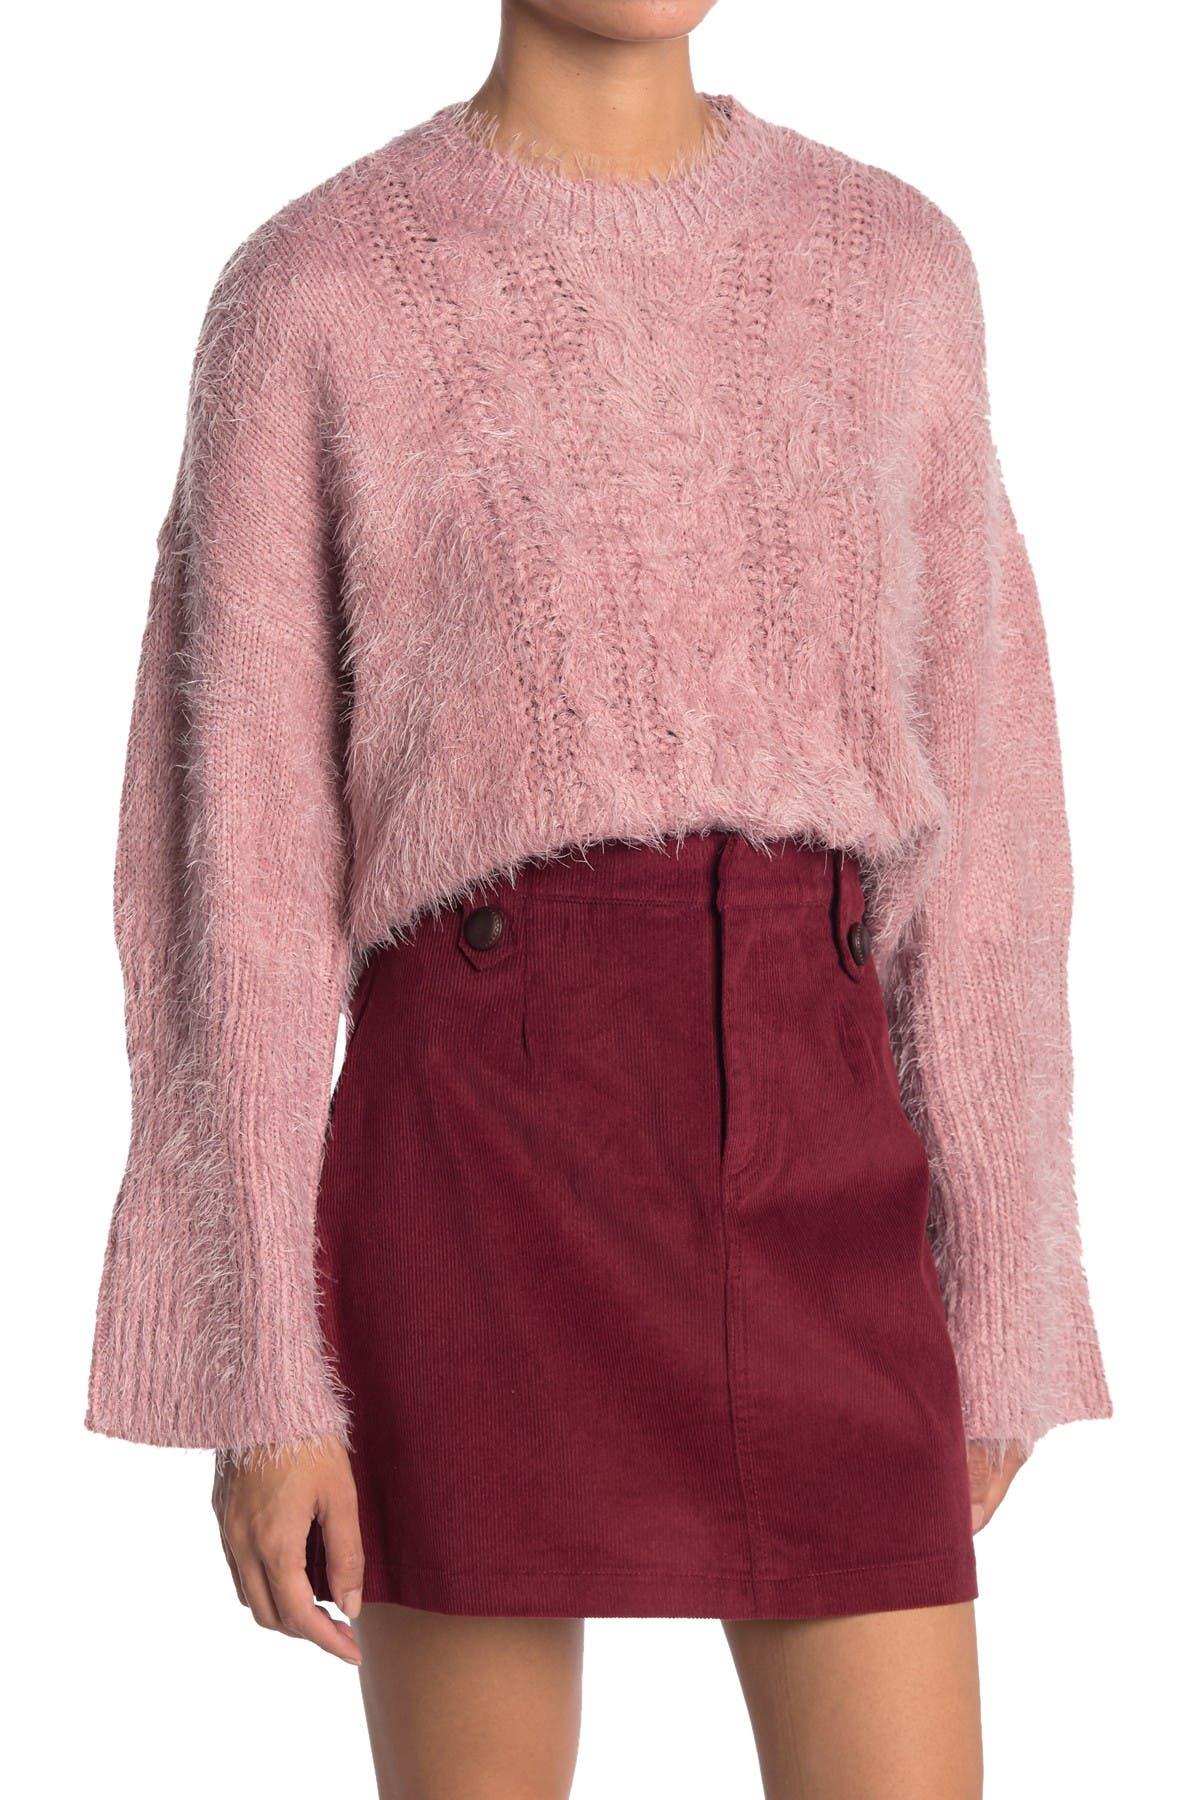 Image of BB Dakota Feelin Lashy Eyelash Knit Sweater